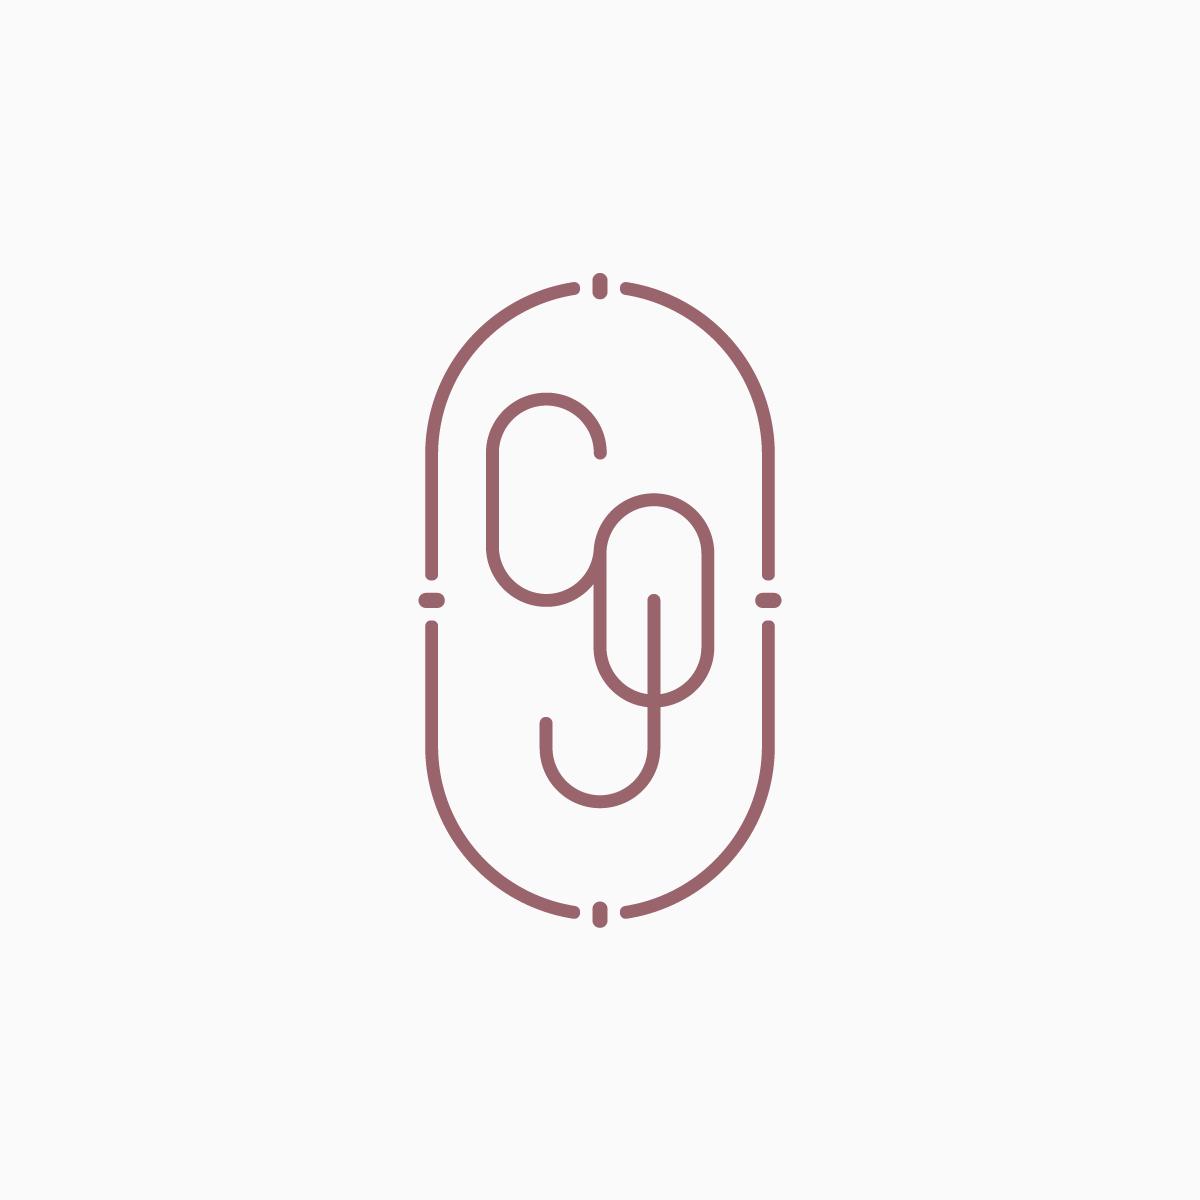 olors of Joy logo ikon